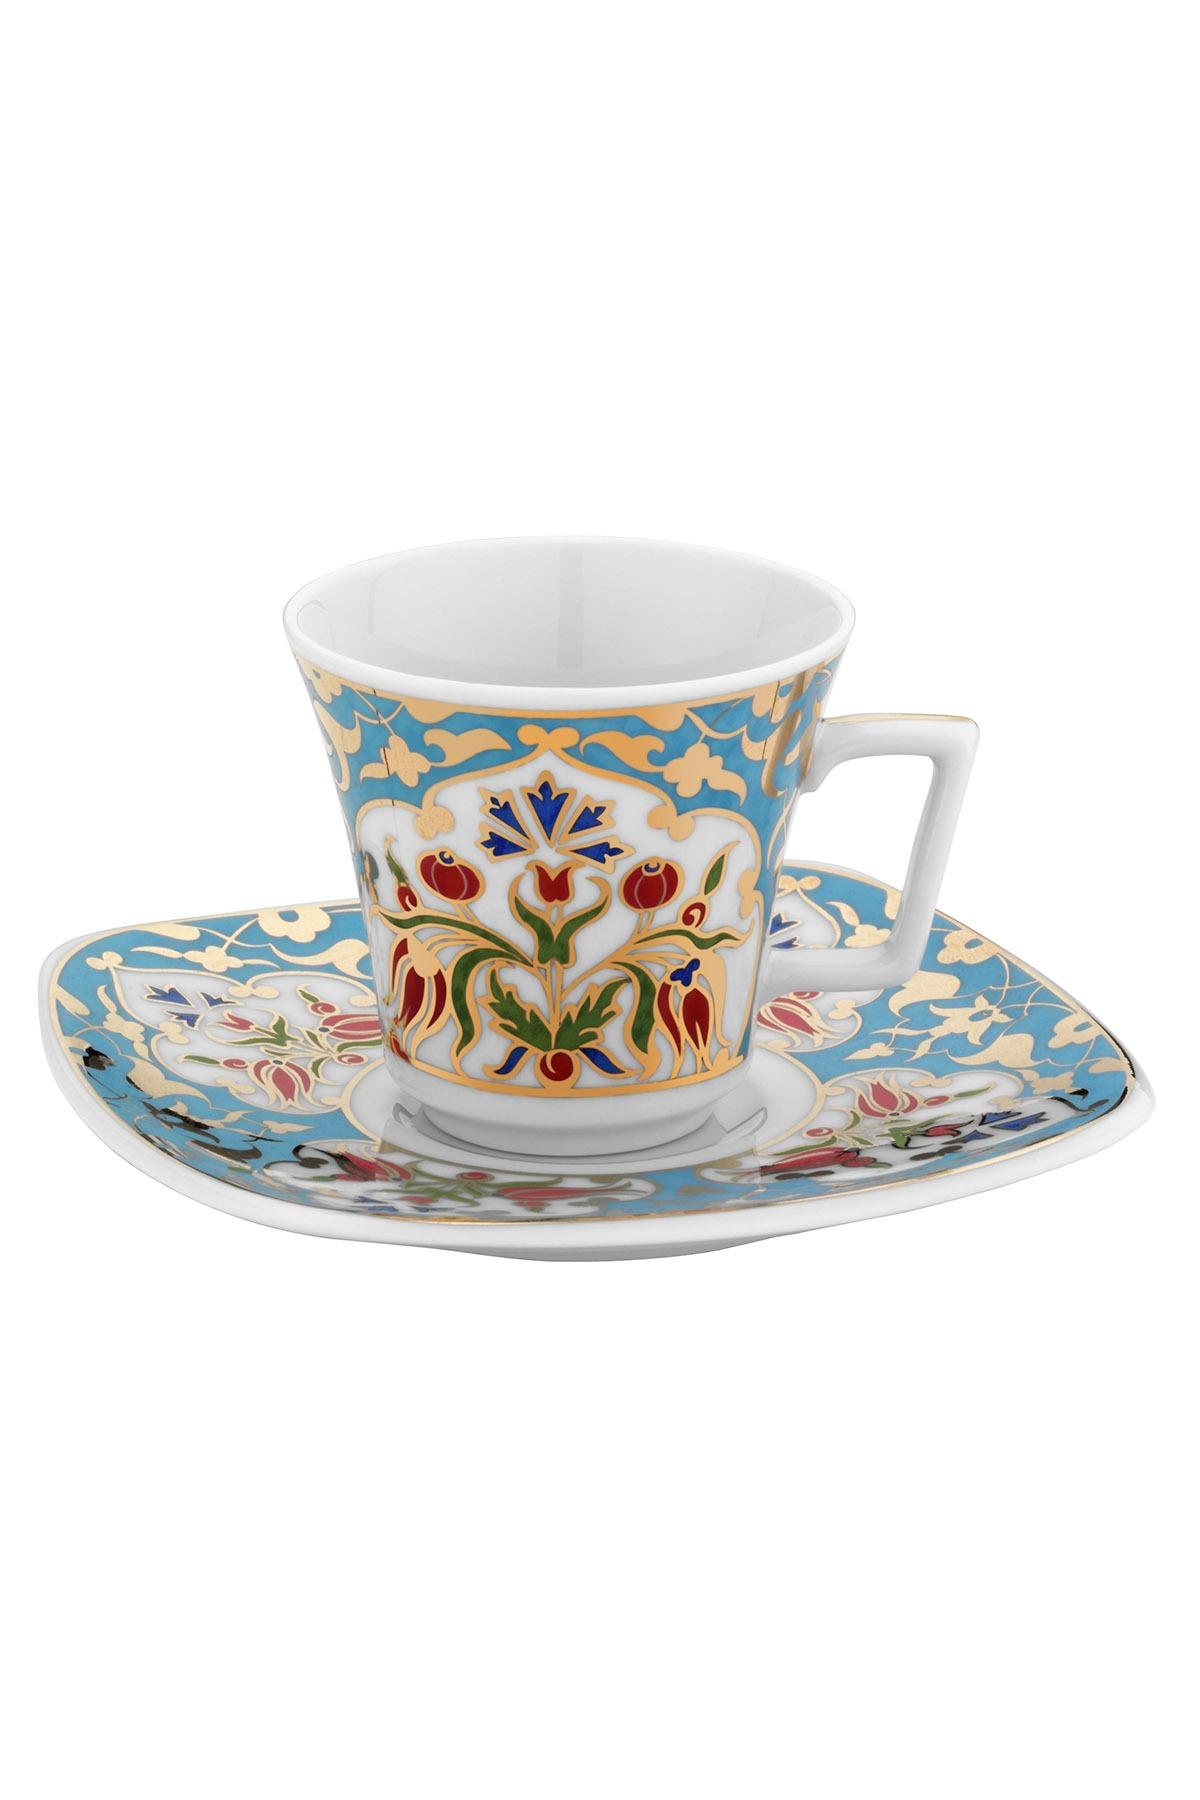 Kütahya Porselen - Kütahya Porselen Medusa 2'li Kahve Takımı Turkuaz